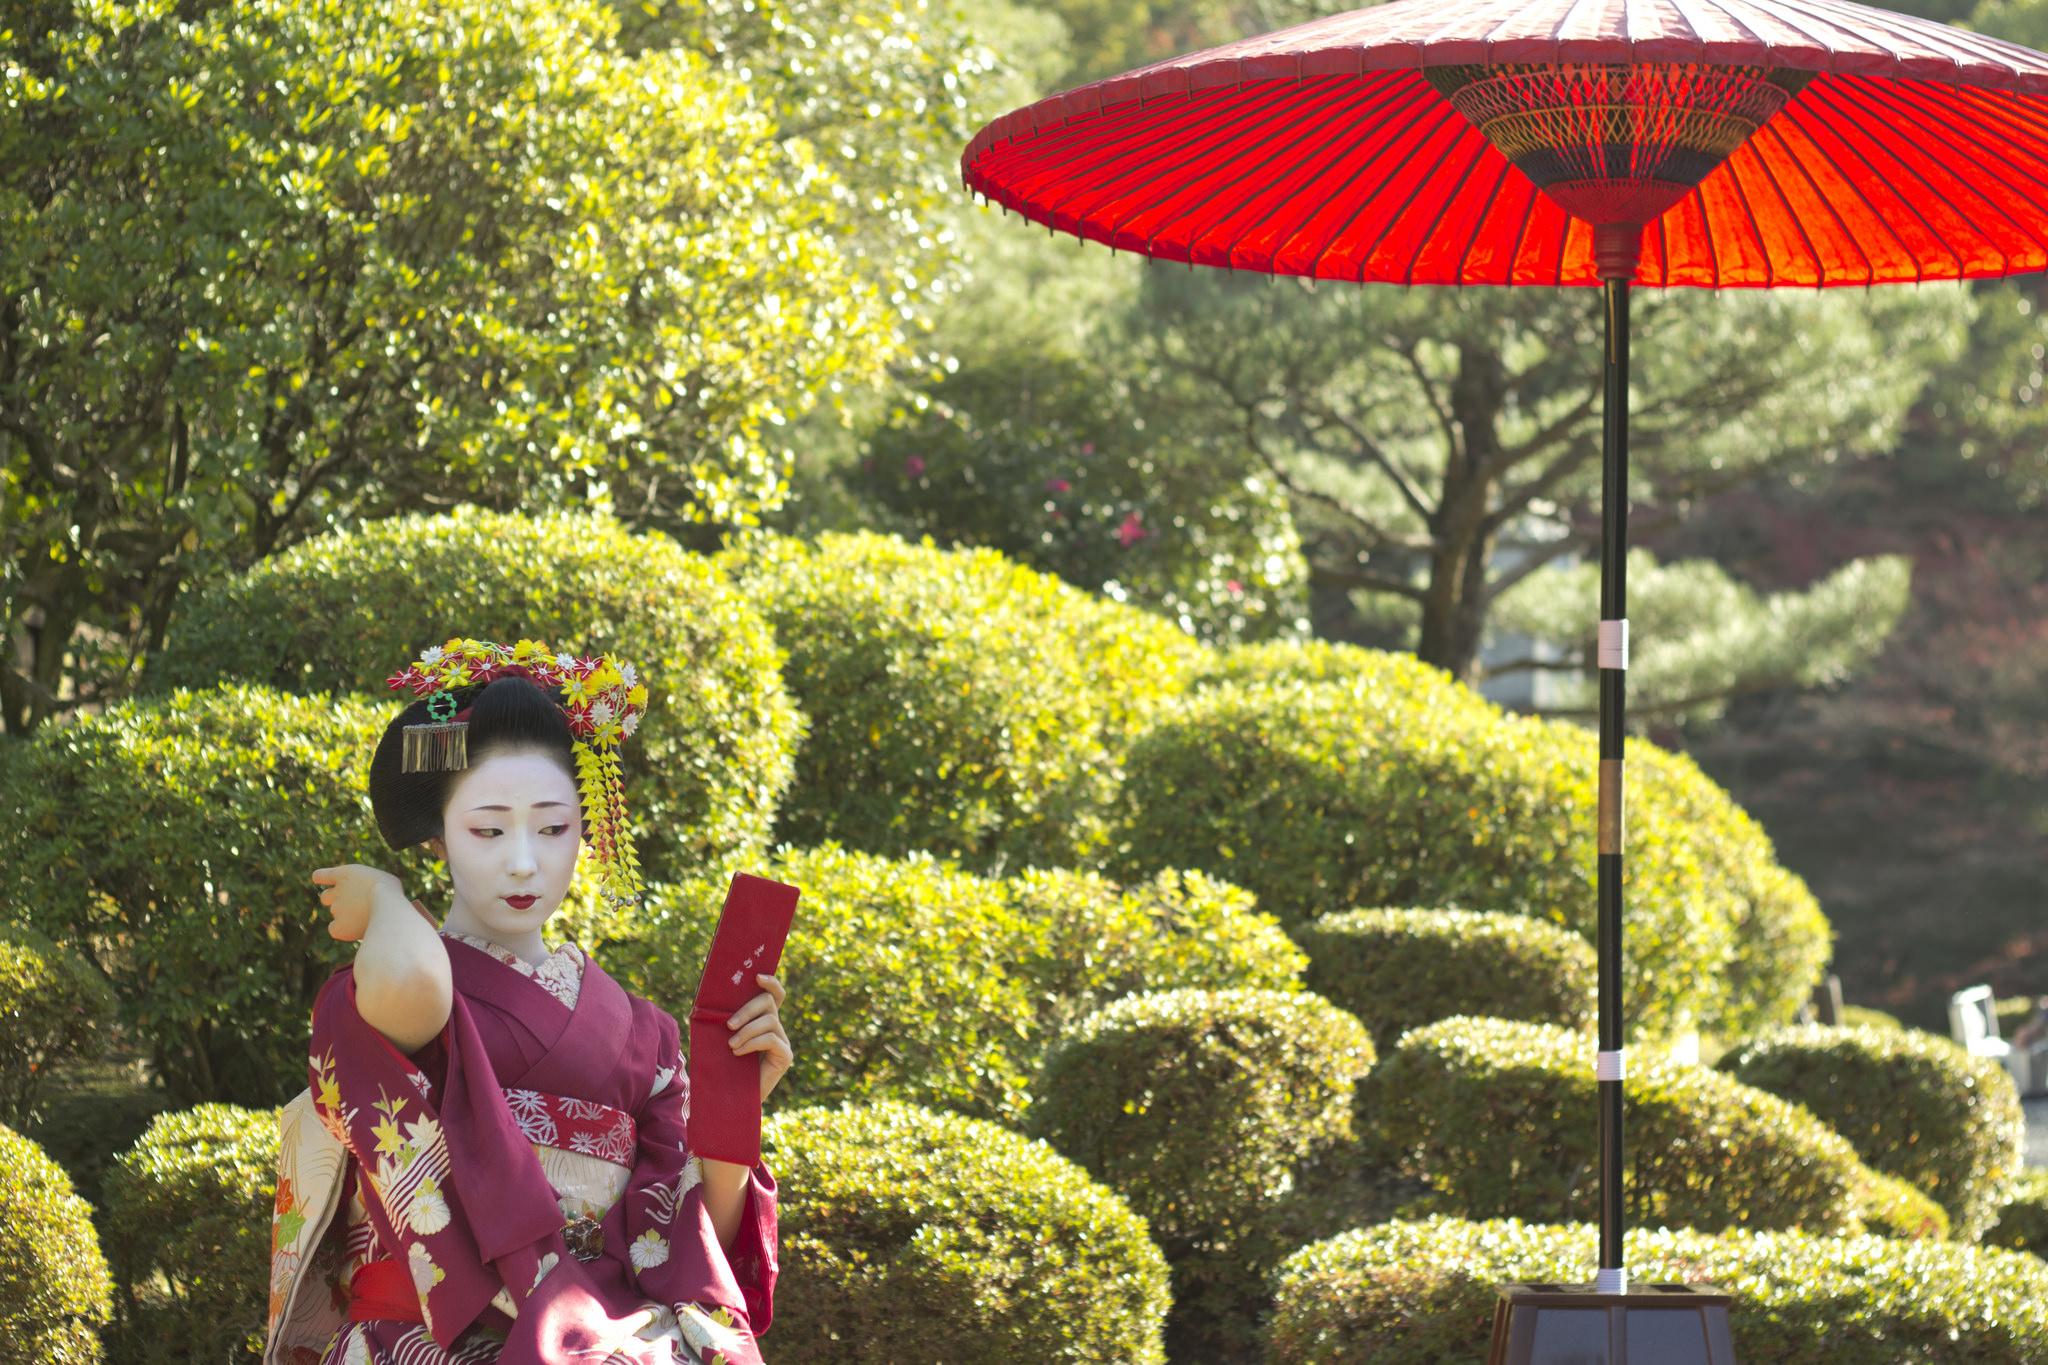 Heian Jingu Reisai Festival